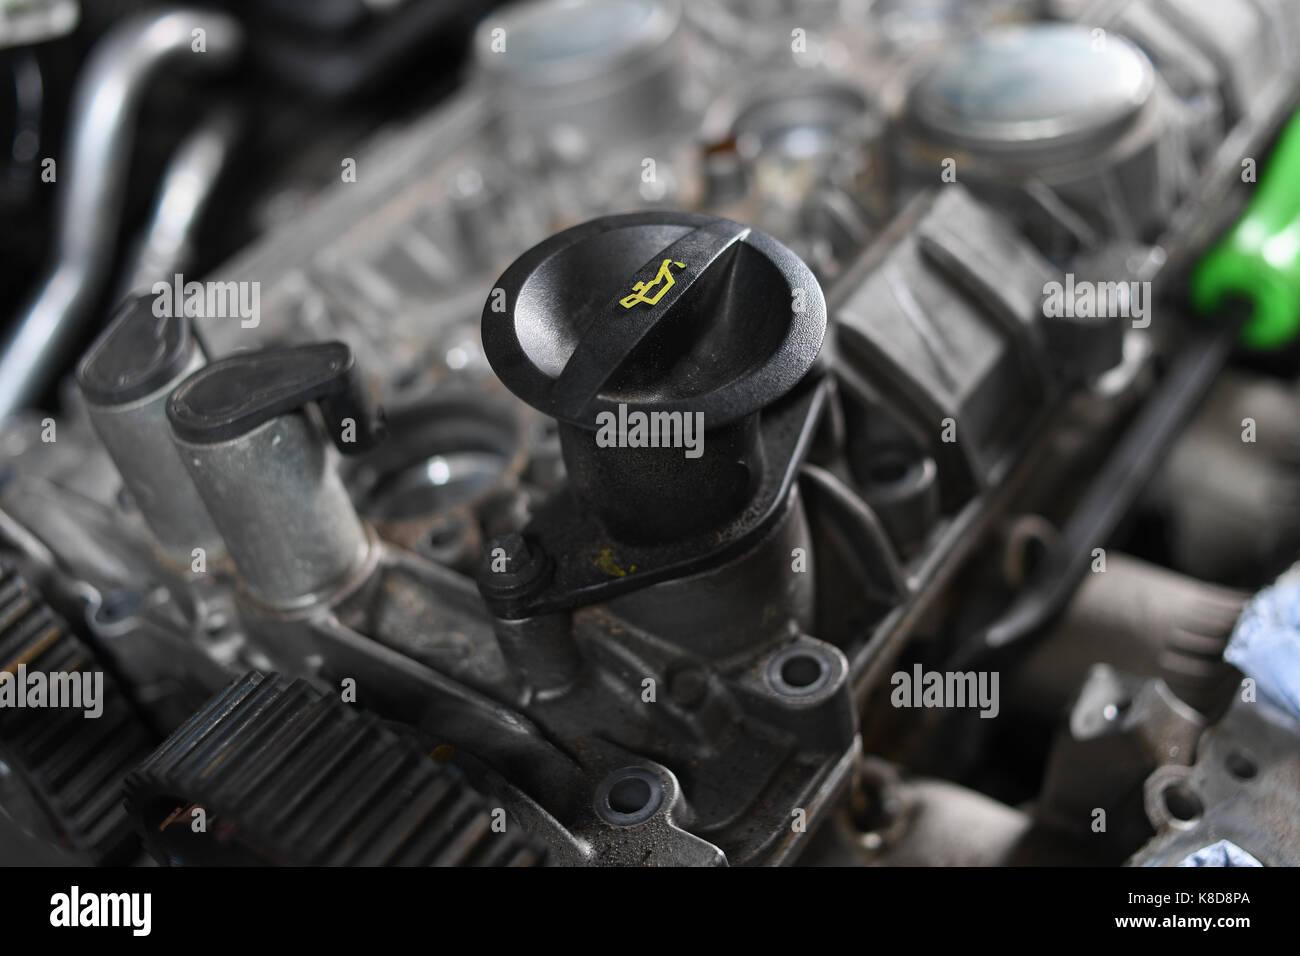 Ford Focus Oil Cap In Engine Stock Photo 160102834 Alamy